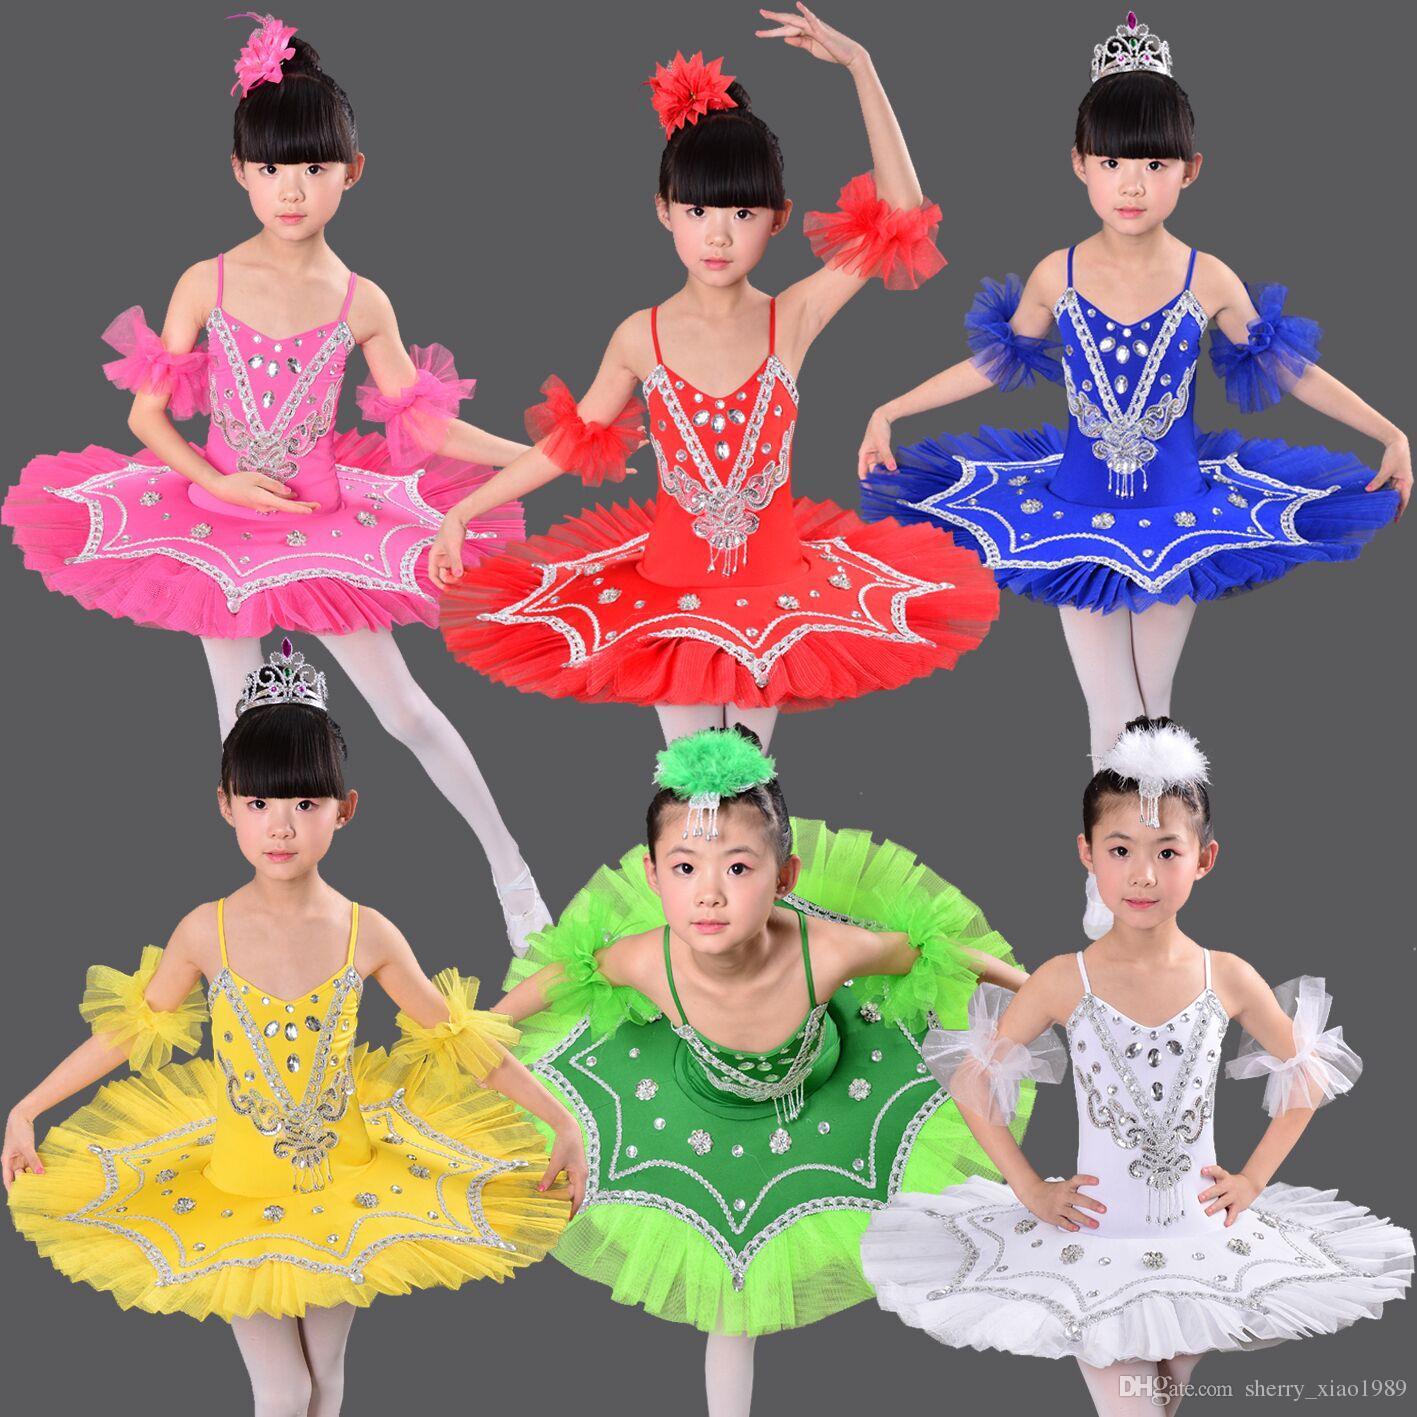 Professional White Swan Lake Ballet Tutu Costume Girls Children Ballerina Dress